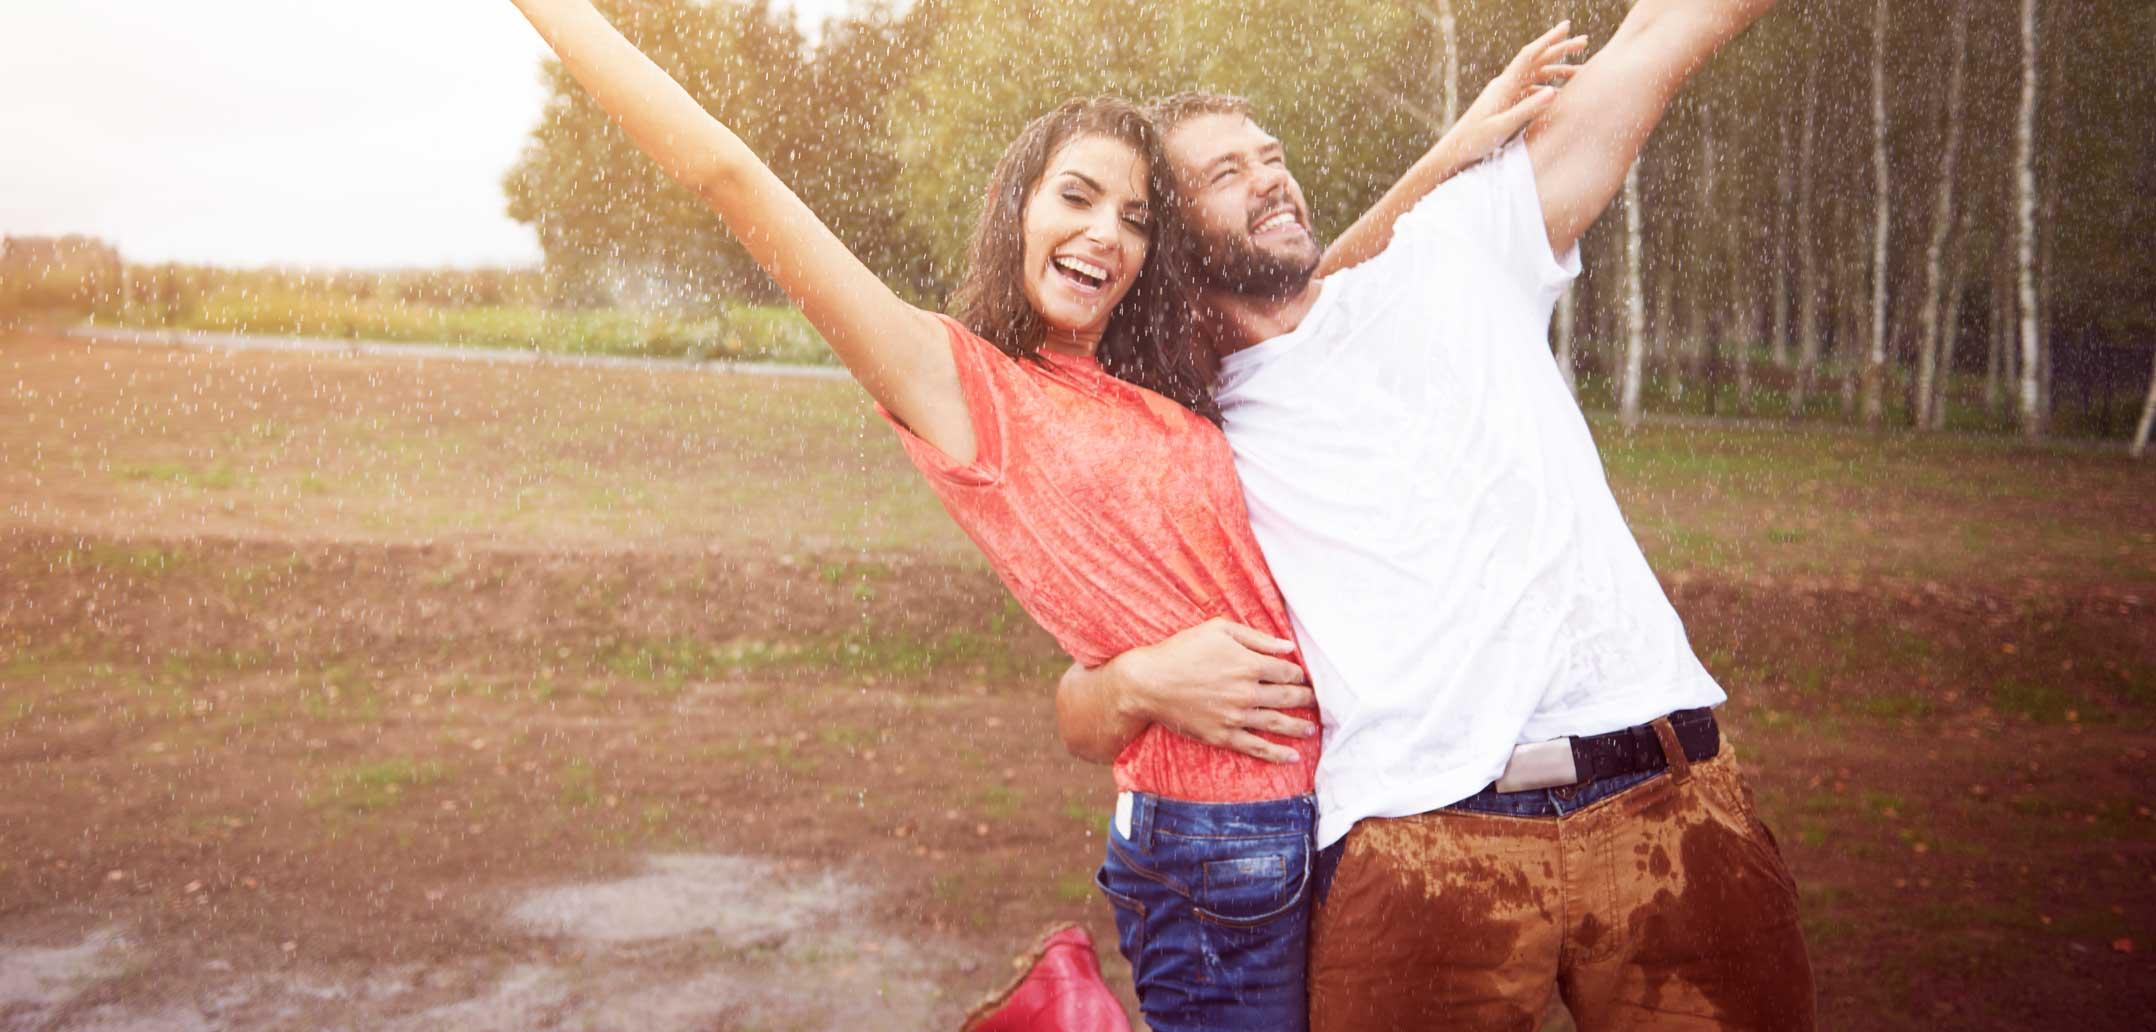 Männer, Frauen, länger leben, Beziehung, Gesundheit